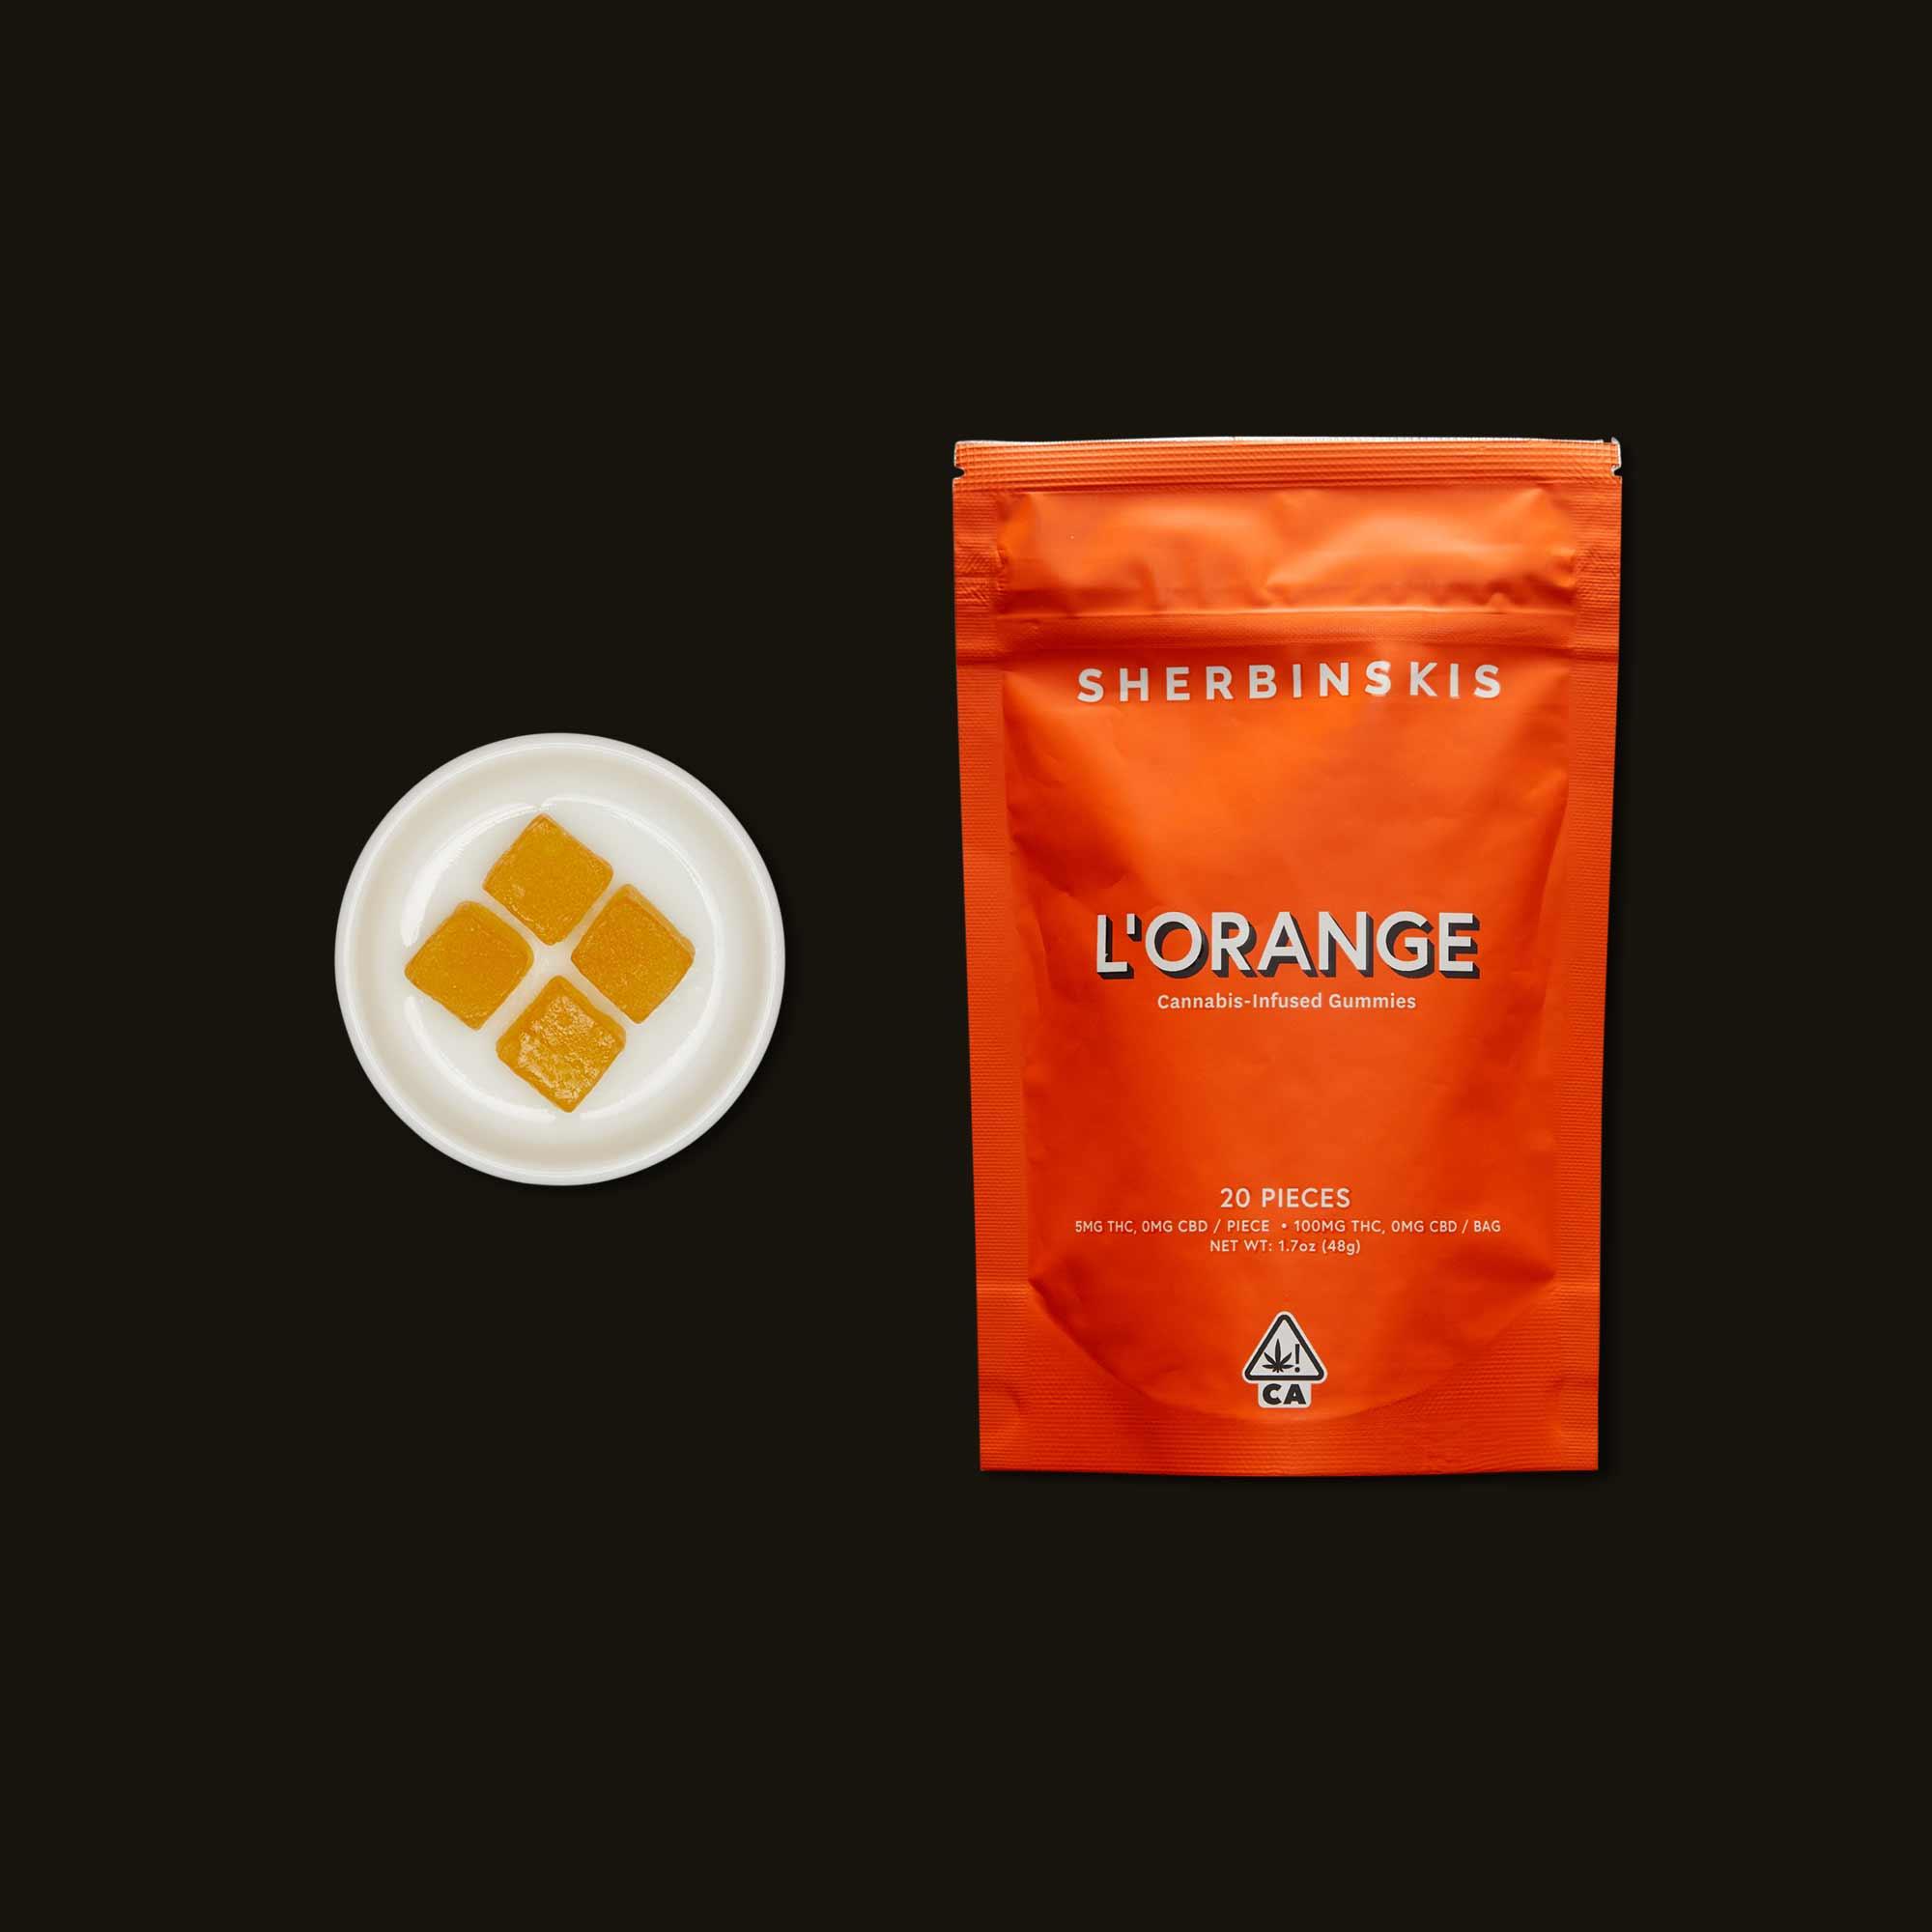 Sherbinskis L'Orange Gummies